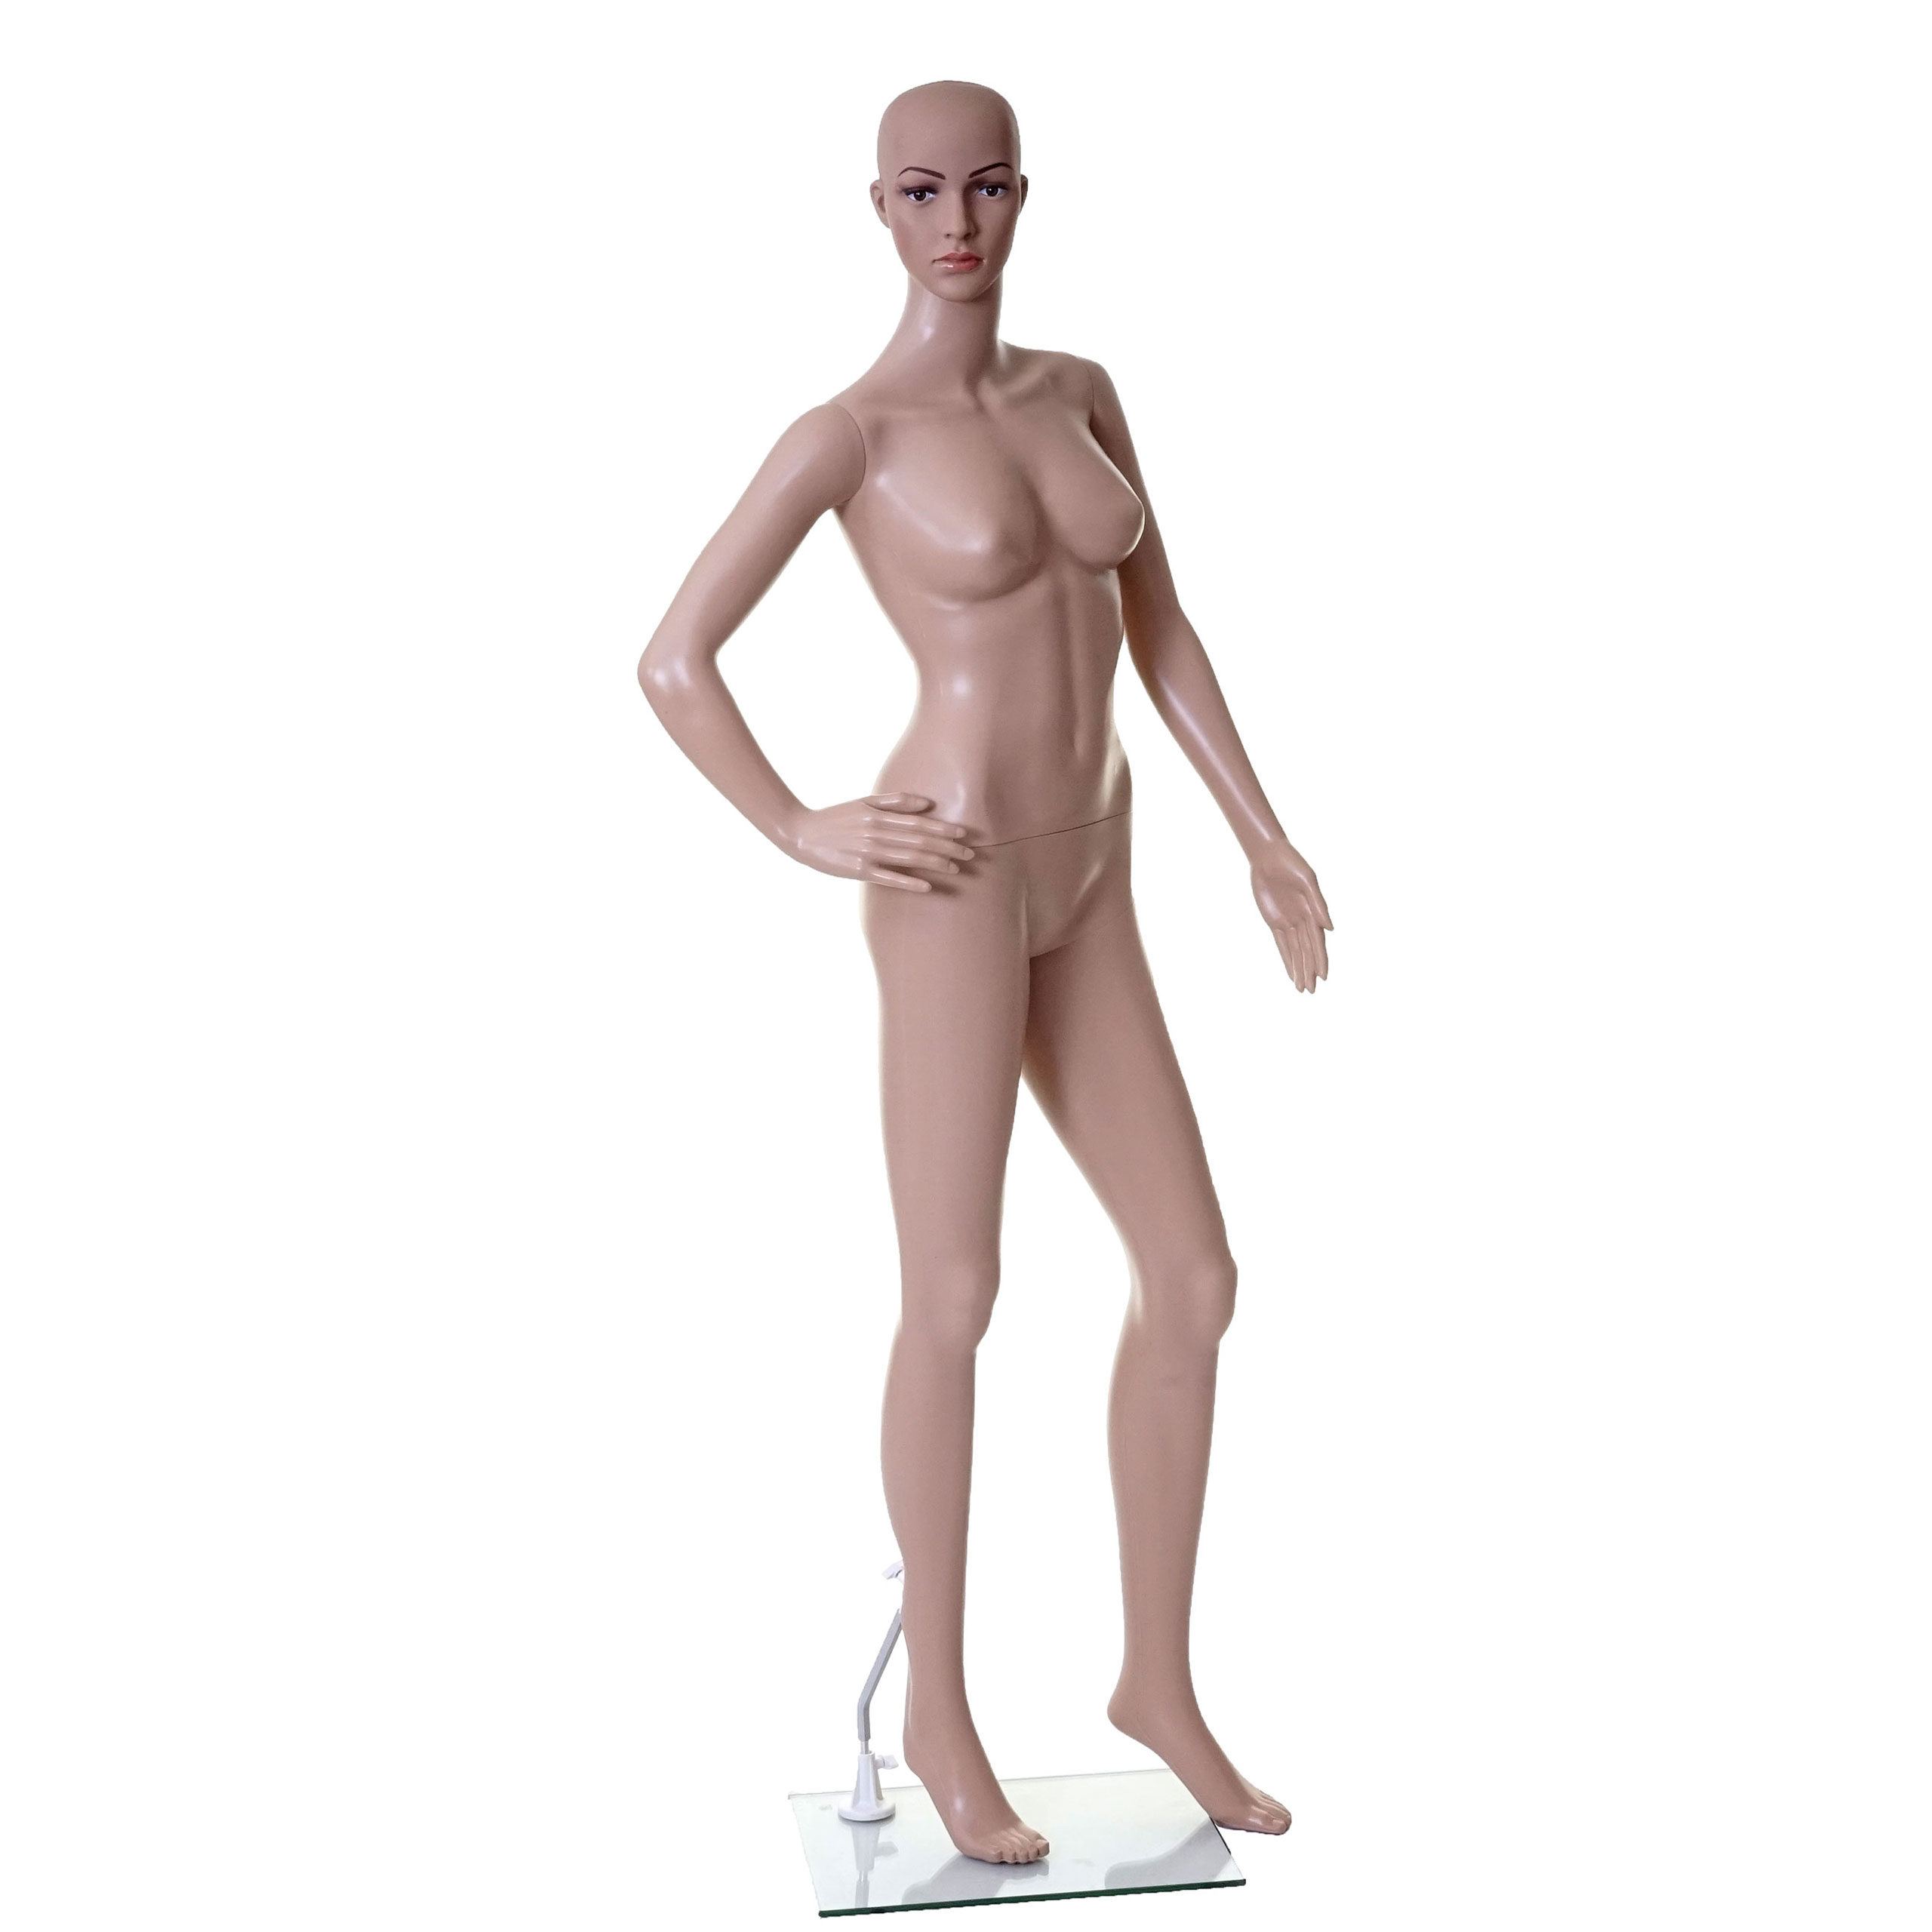 Mendler Schaufensterpuppe HWC-E37, weiblich Frau Schaufensterfigur Puppe Mannequin Schneiderpuppe, lebensgro 65492